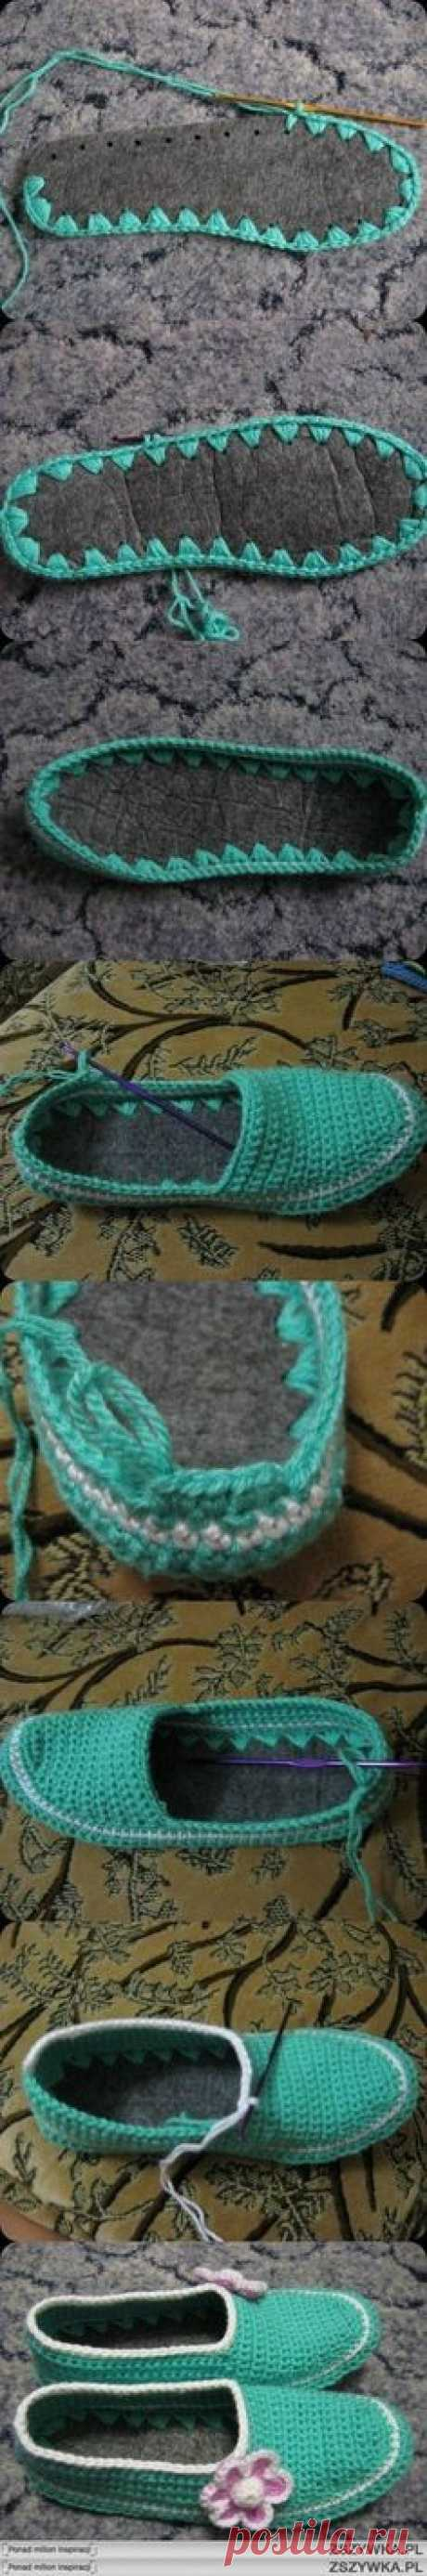 Тапочки крючком на войлочной подошве: обвязка подошвы